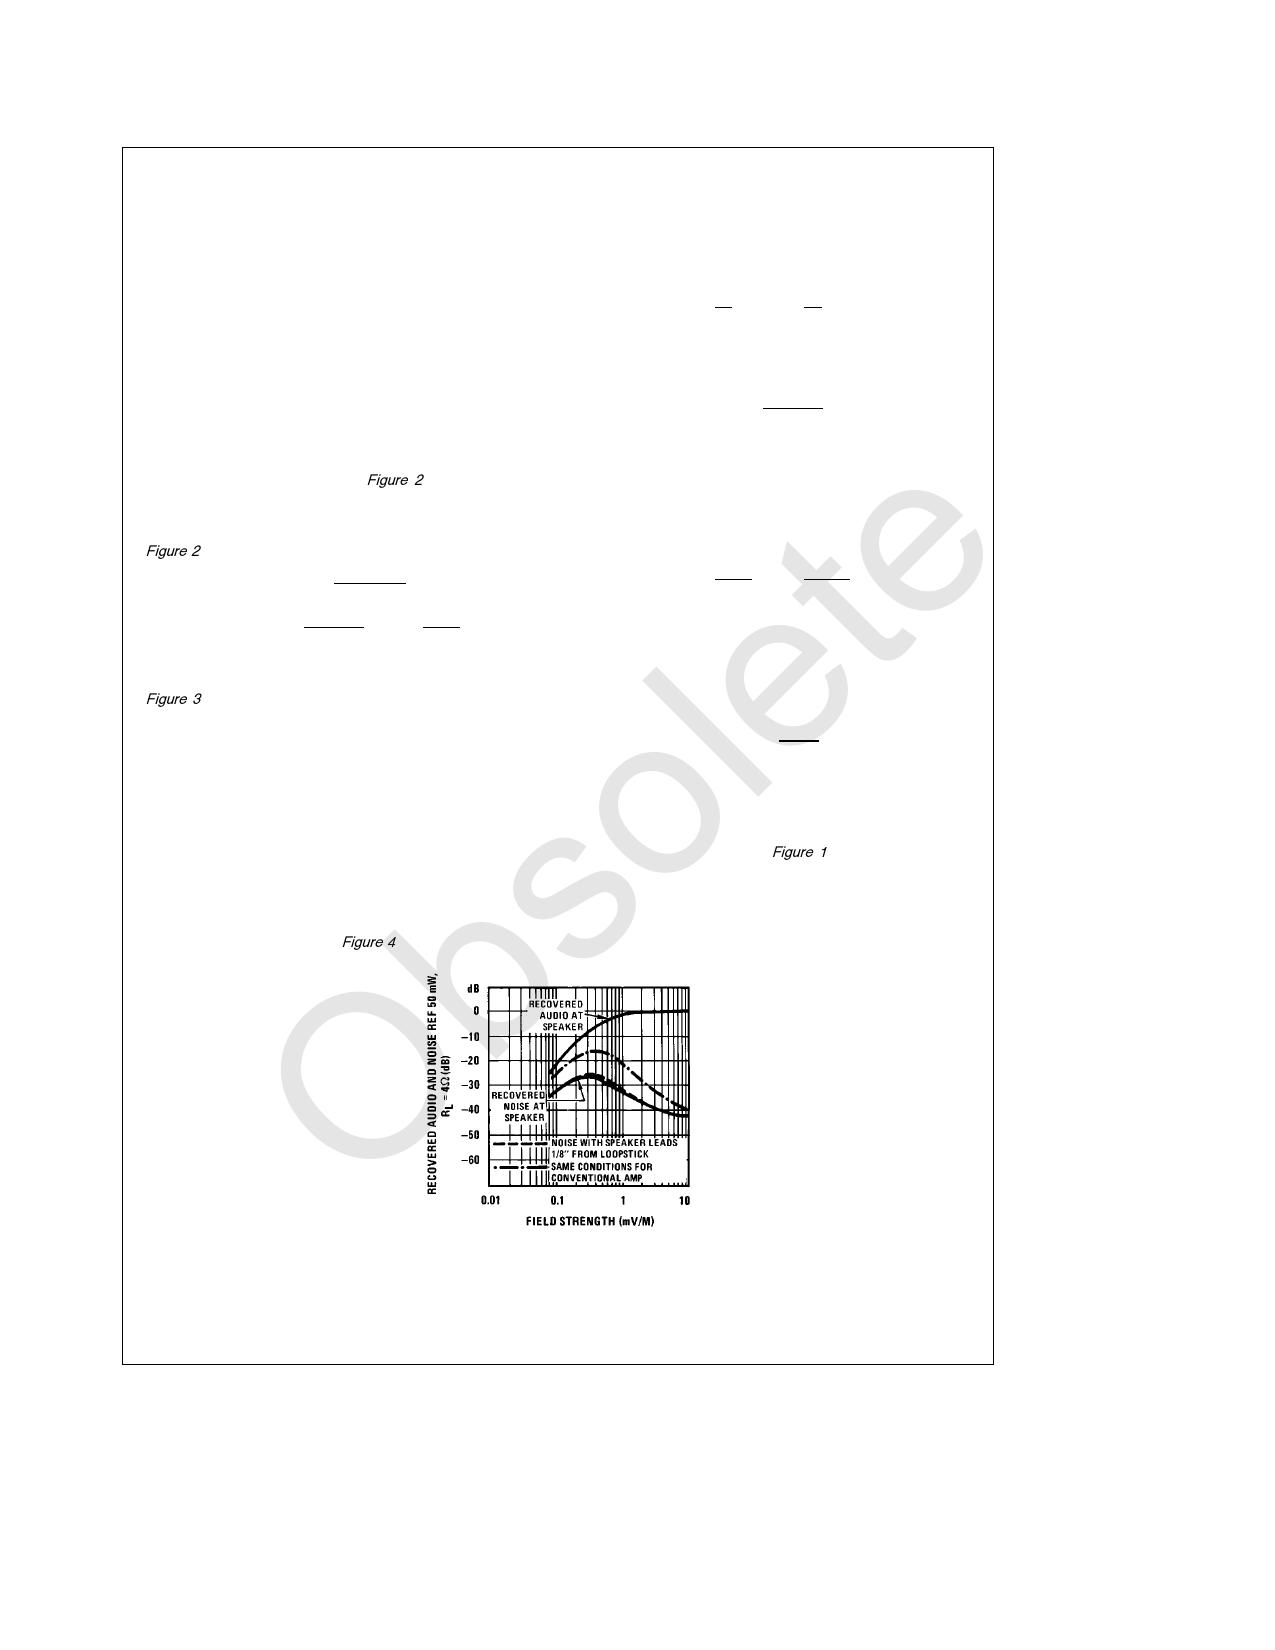 LM2896 Datasheet, Funktion